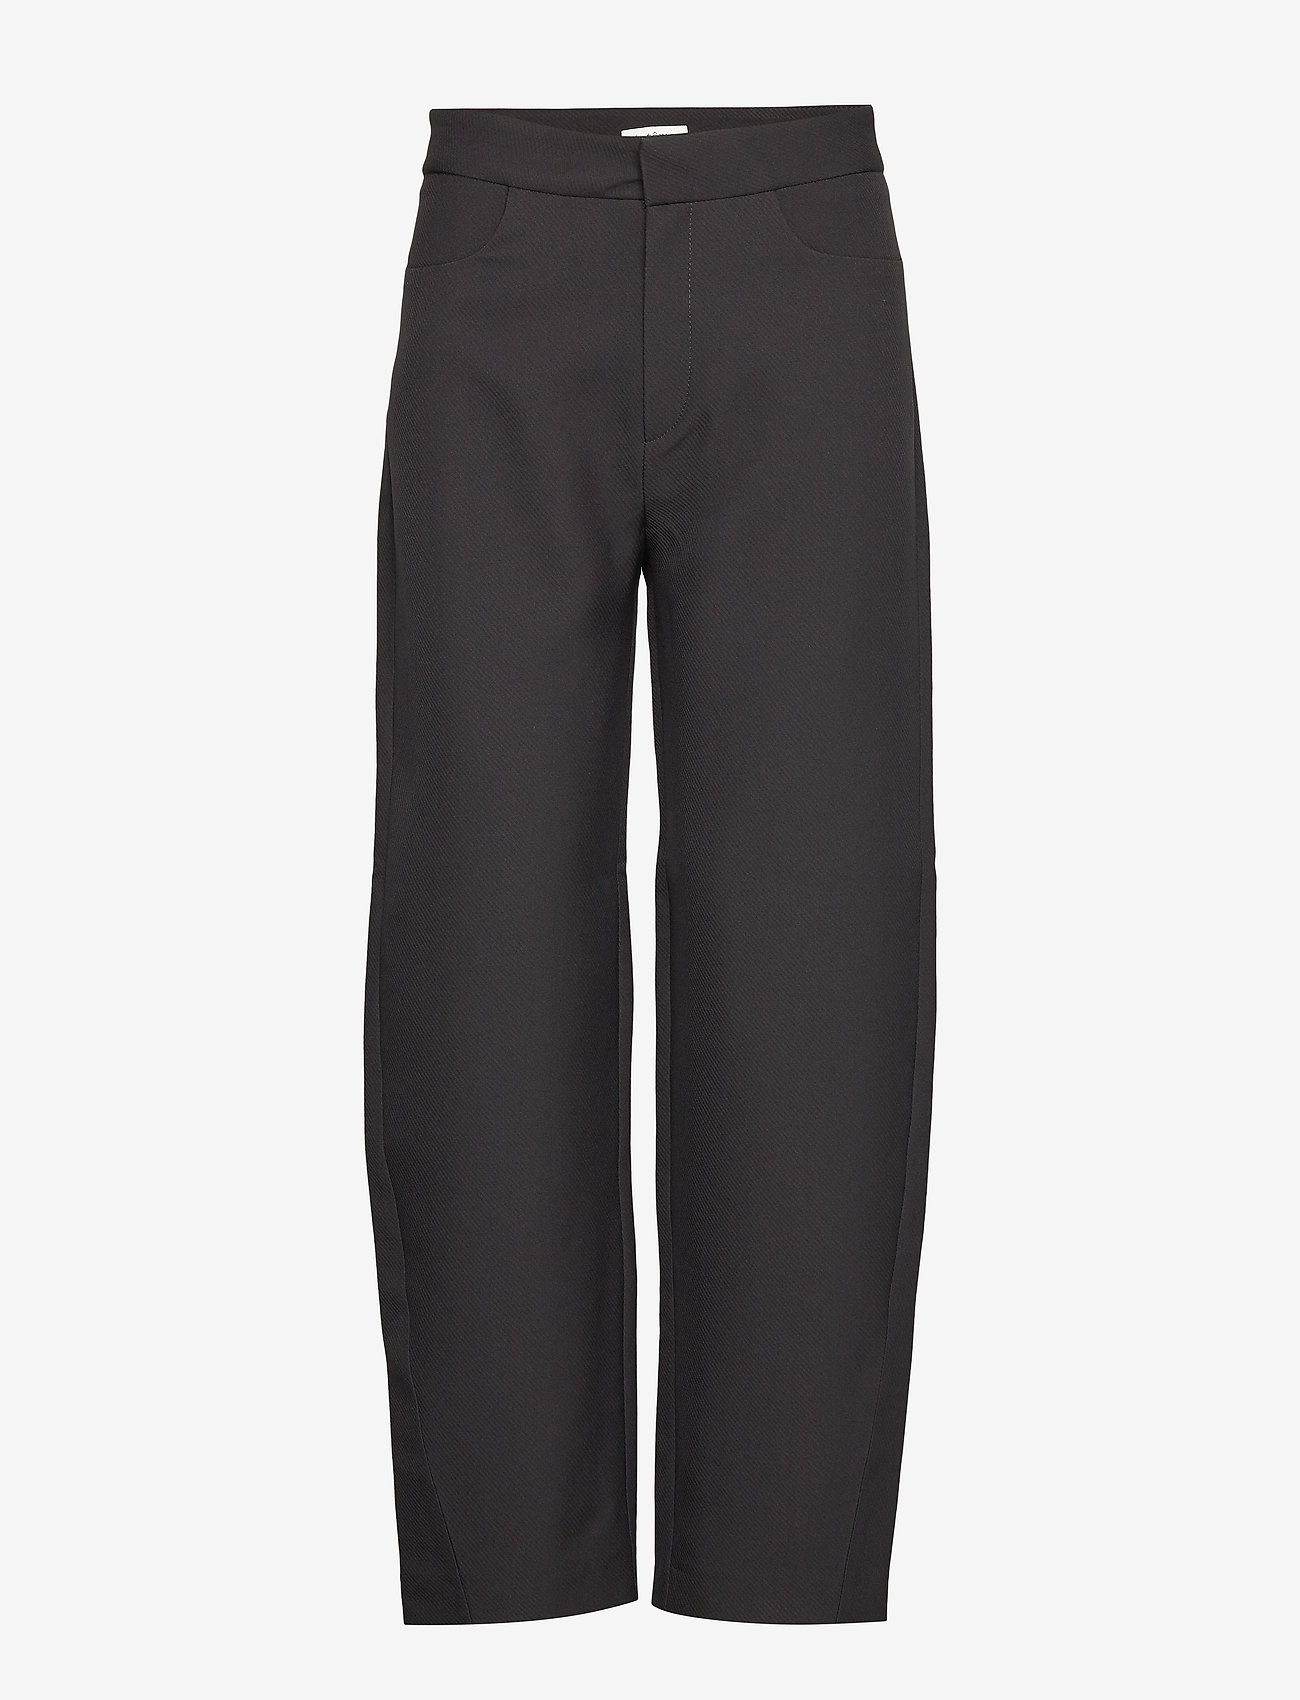 Totême - NOVARA - bukser med brede ben - black 200 - 0